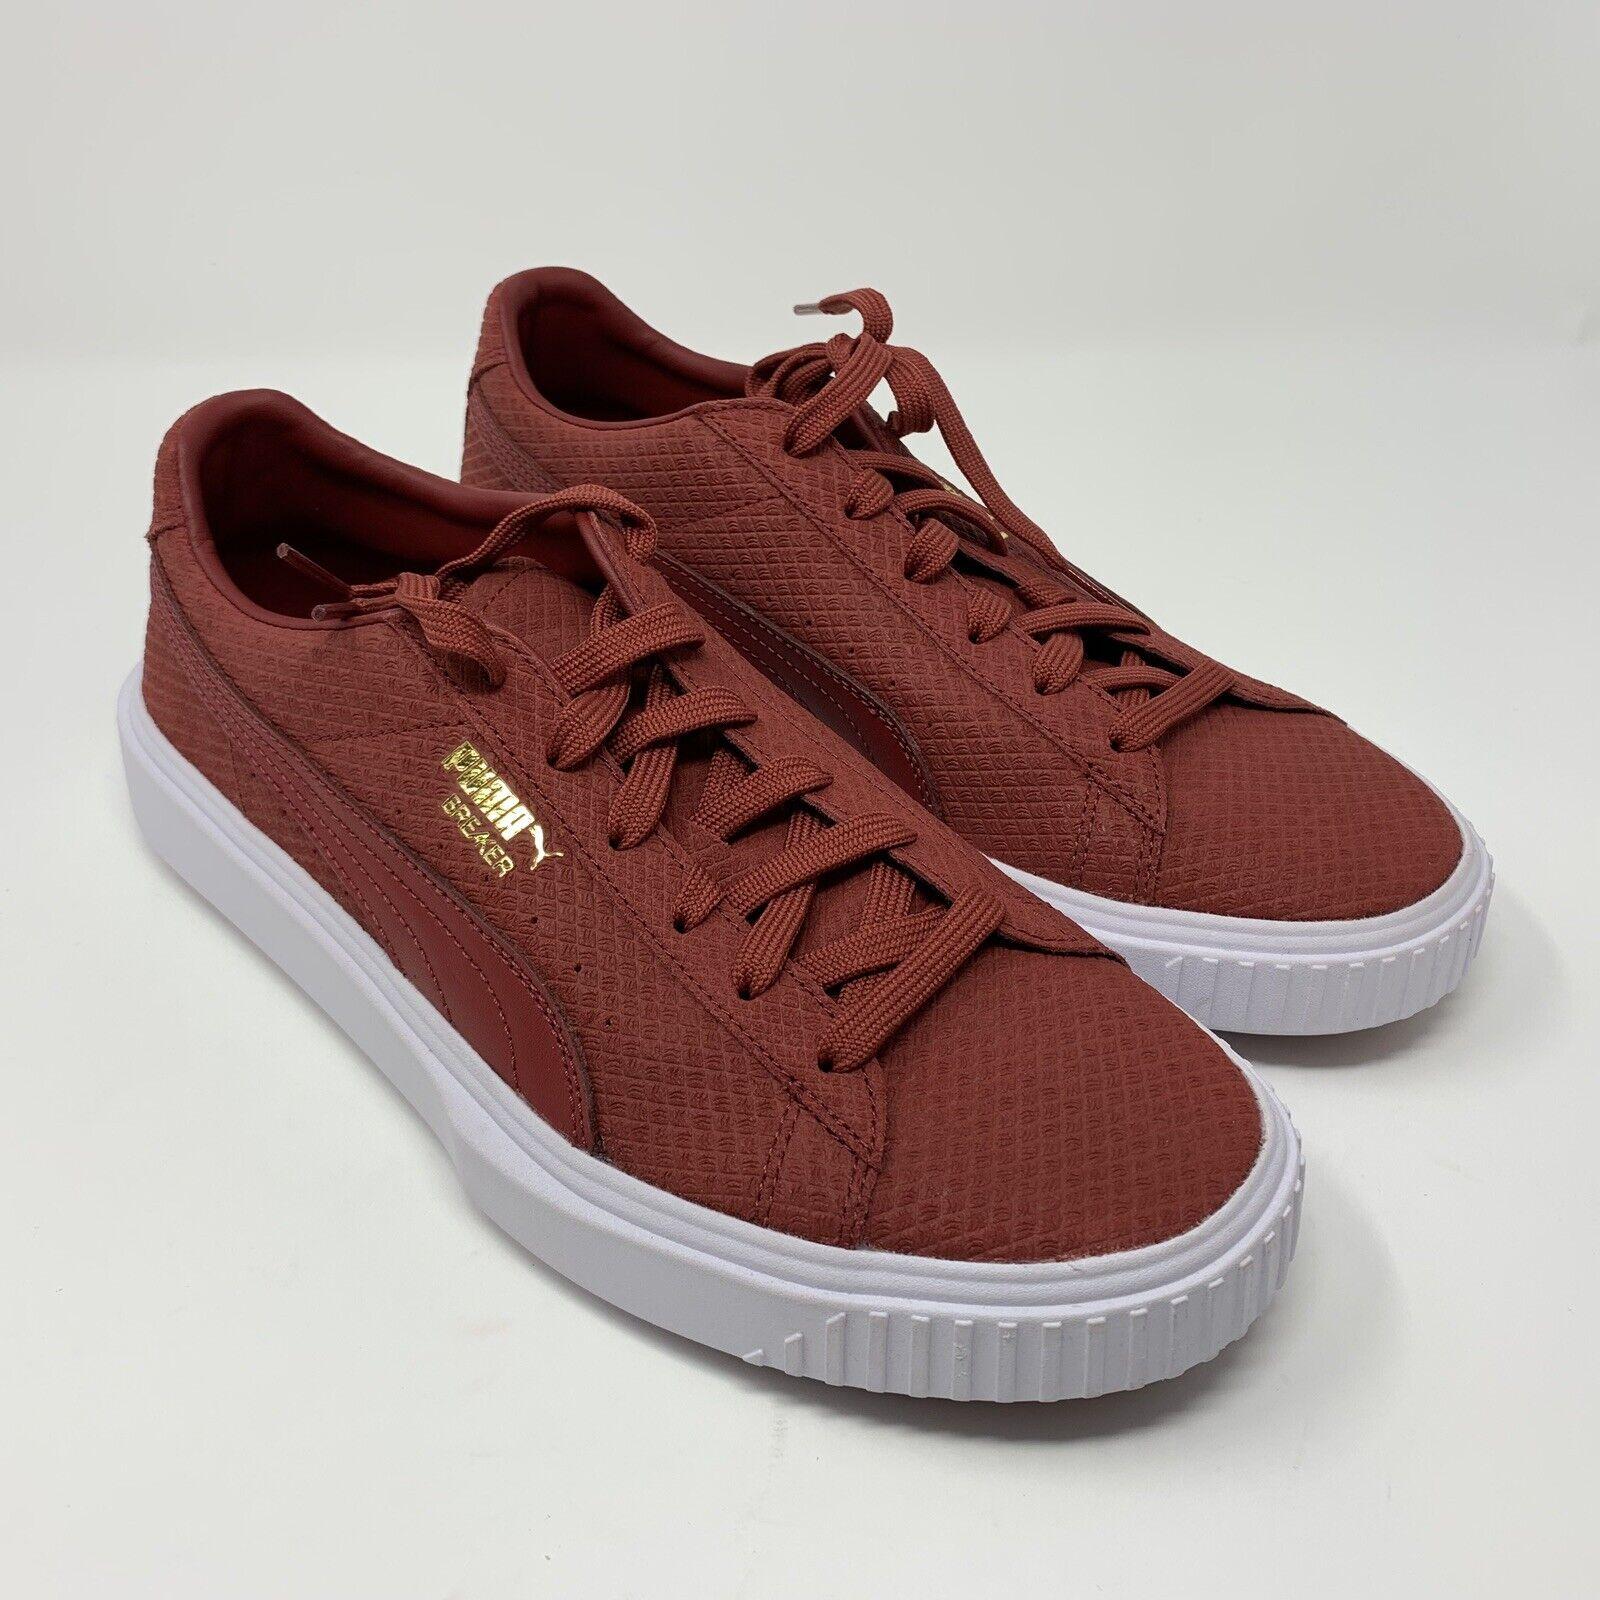 Puma Men's Breaker Suede Red Dahlia Sneakers Size 9.5 366077-02